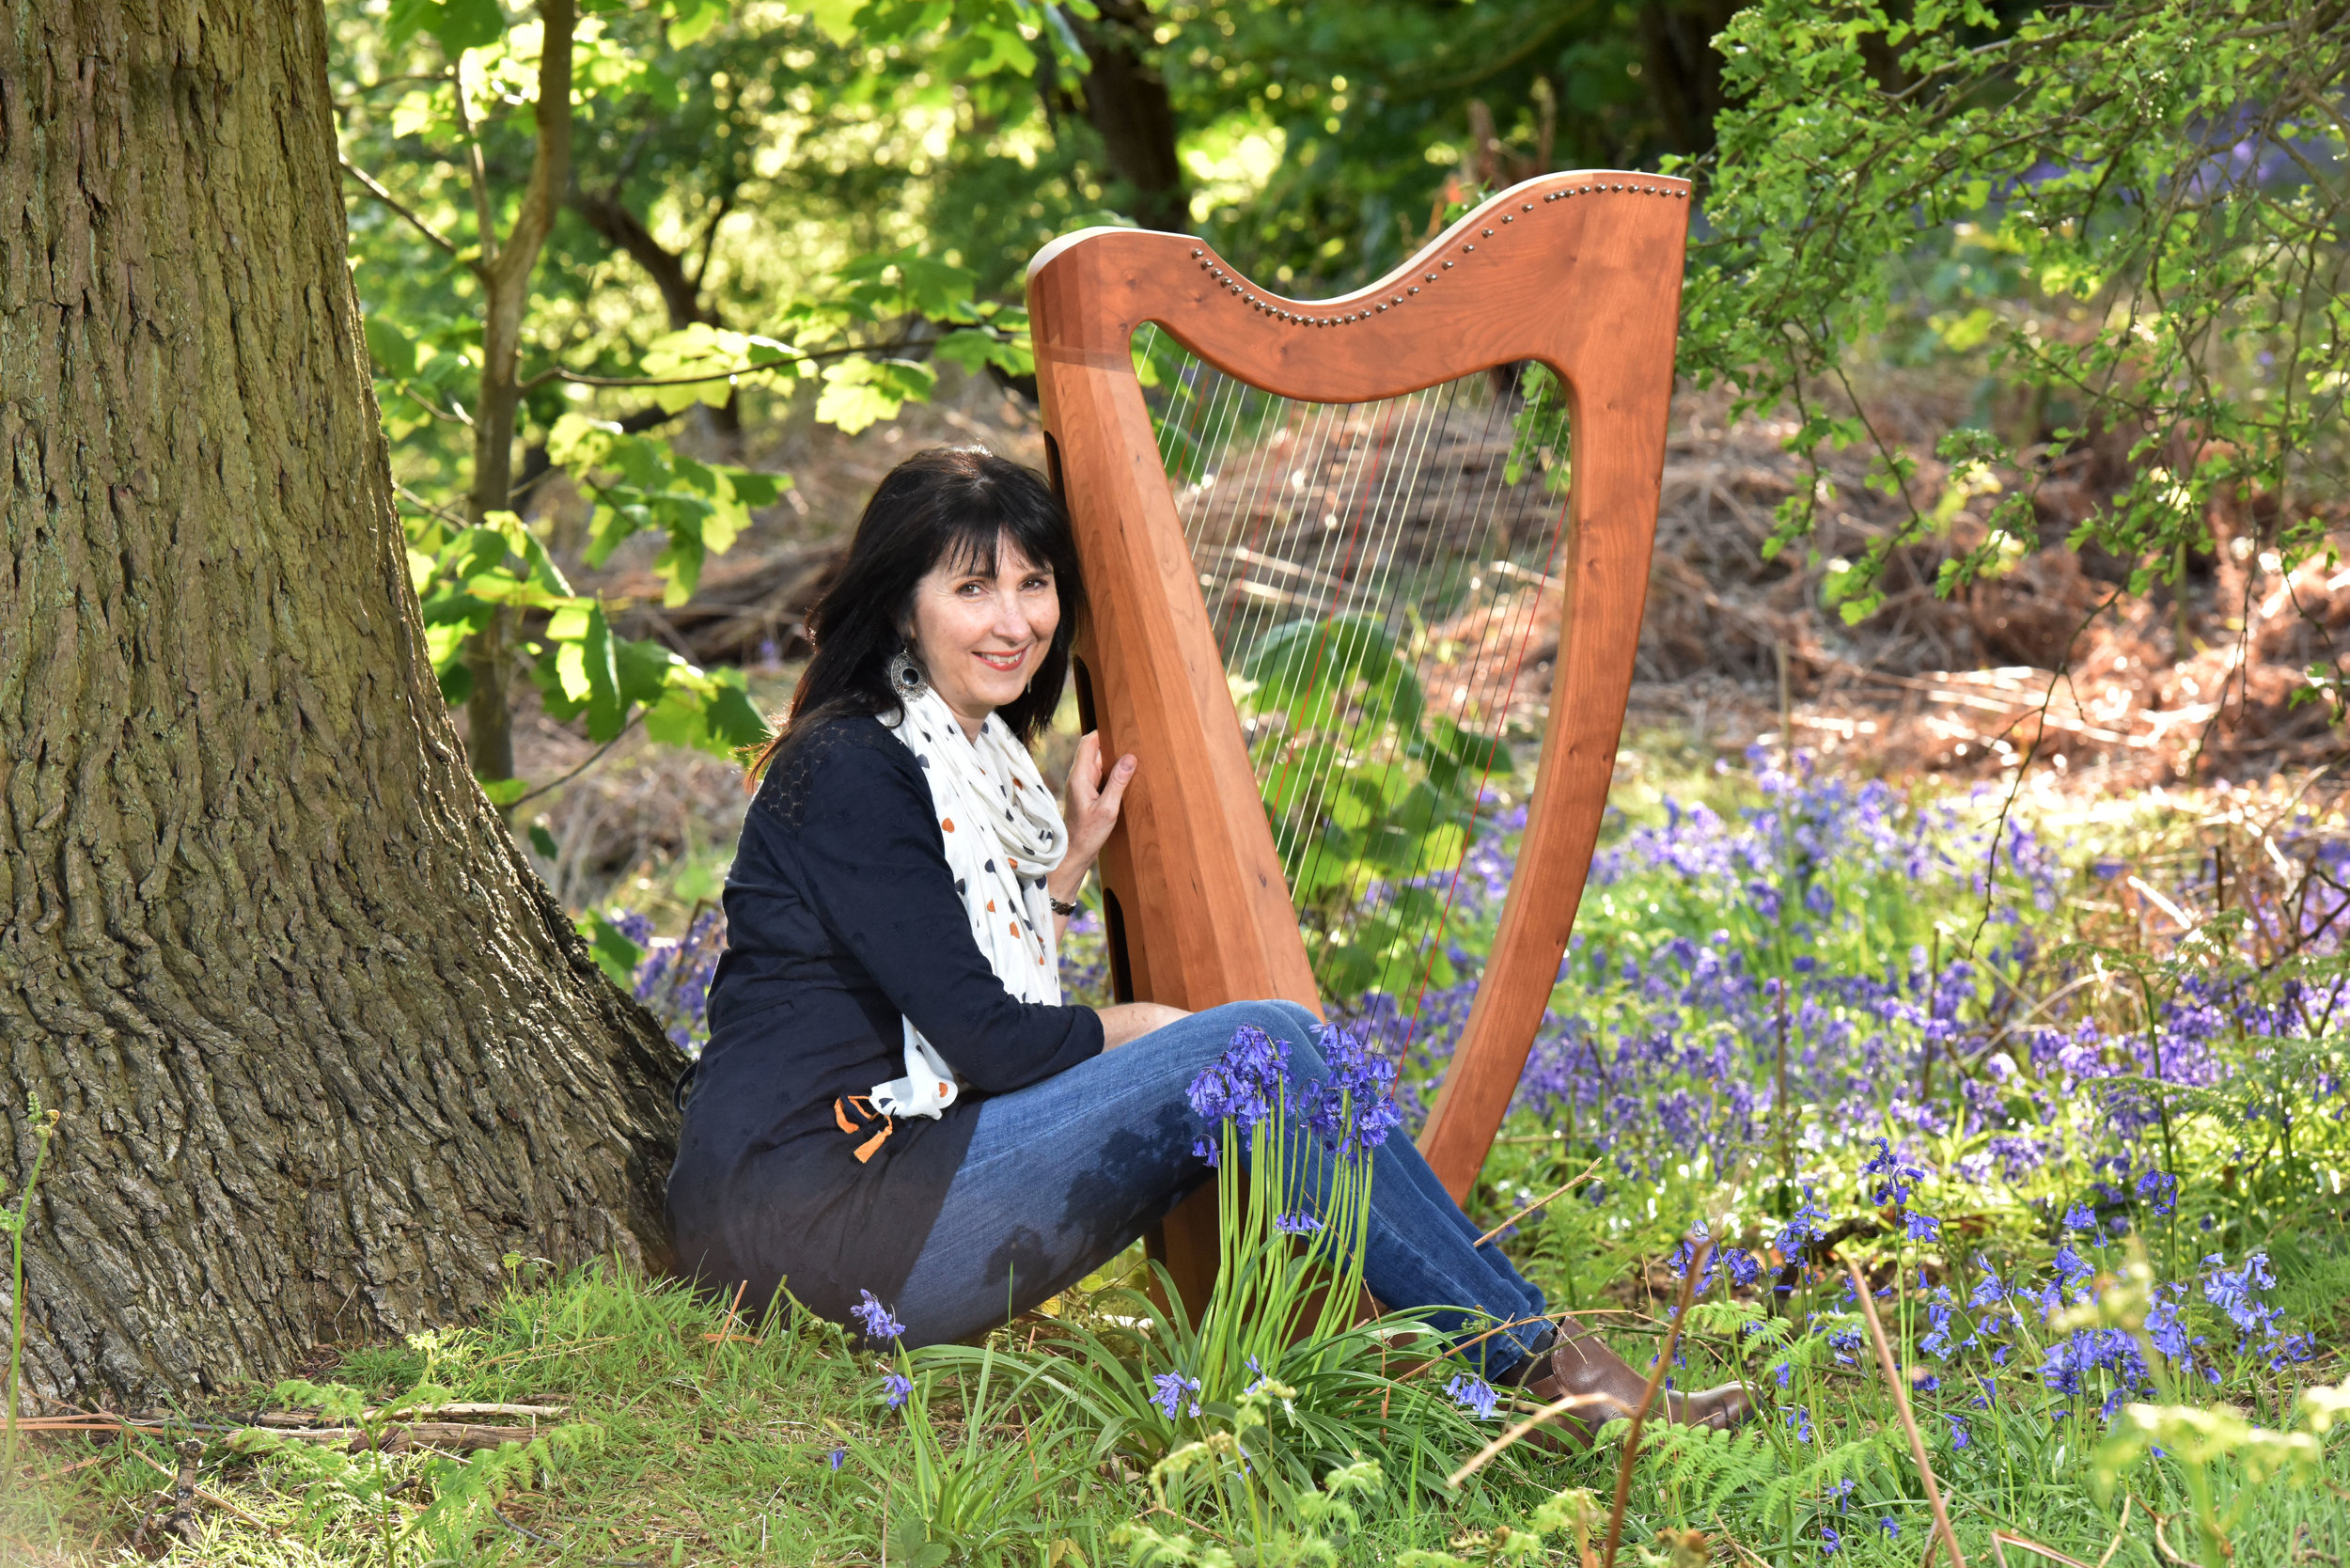 oona-Linnett-wedding-harpist-Dunham-Massey-Bluebell-wood